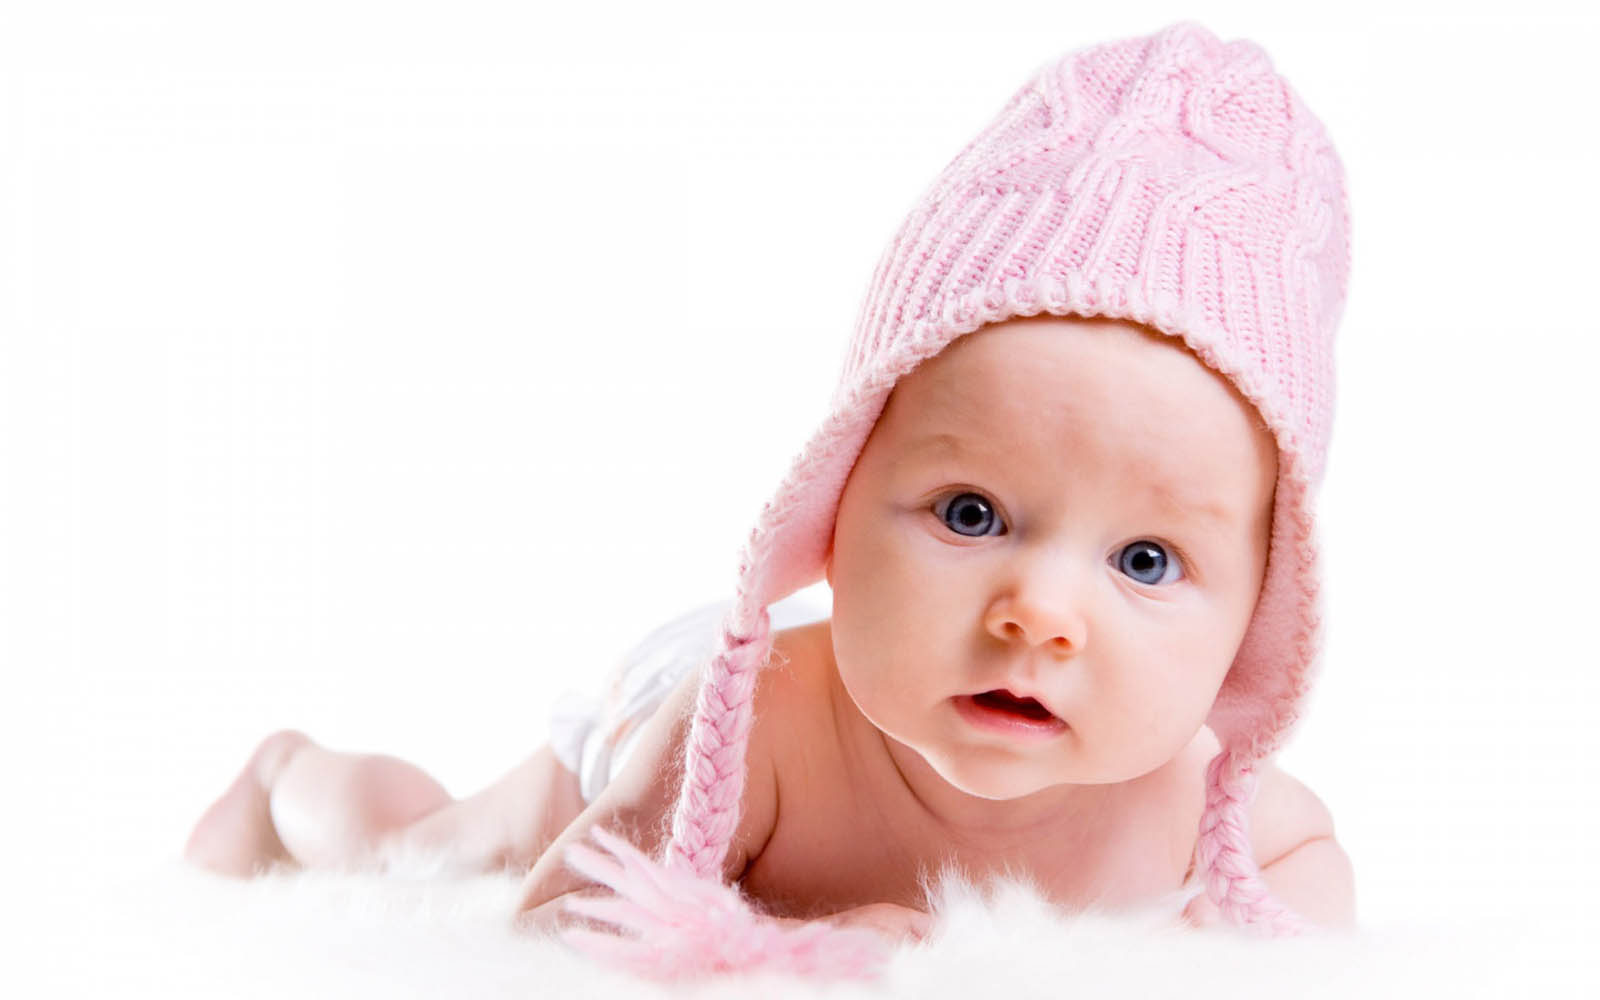 wallpaper: Baby Girl Wallpapers